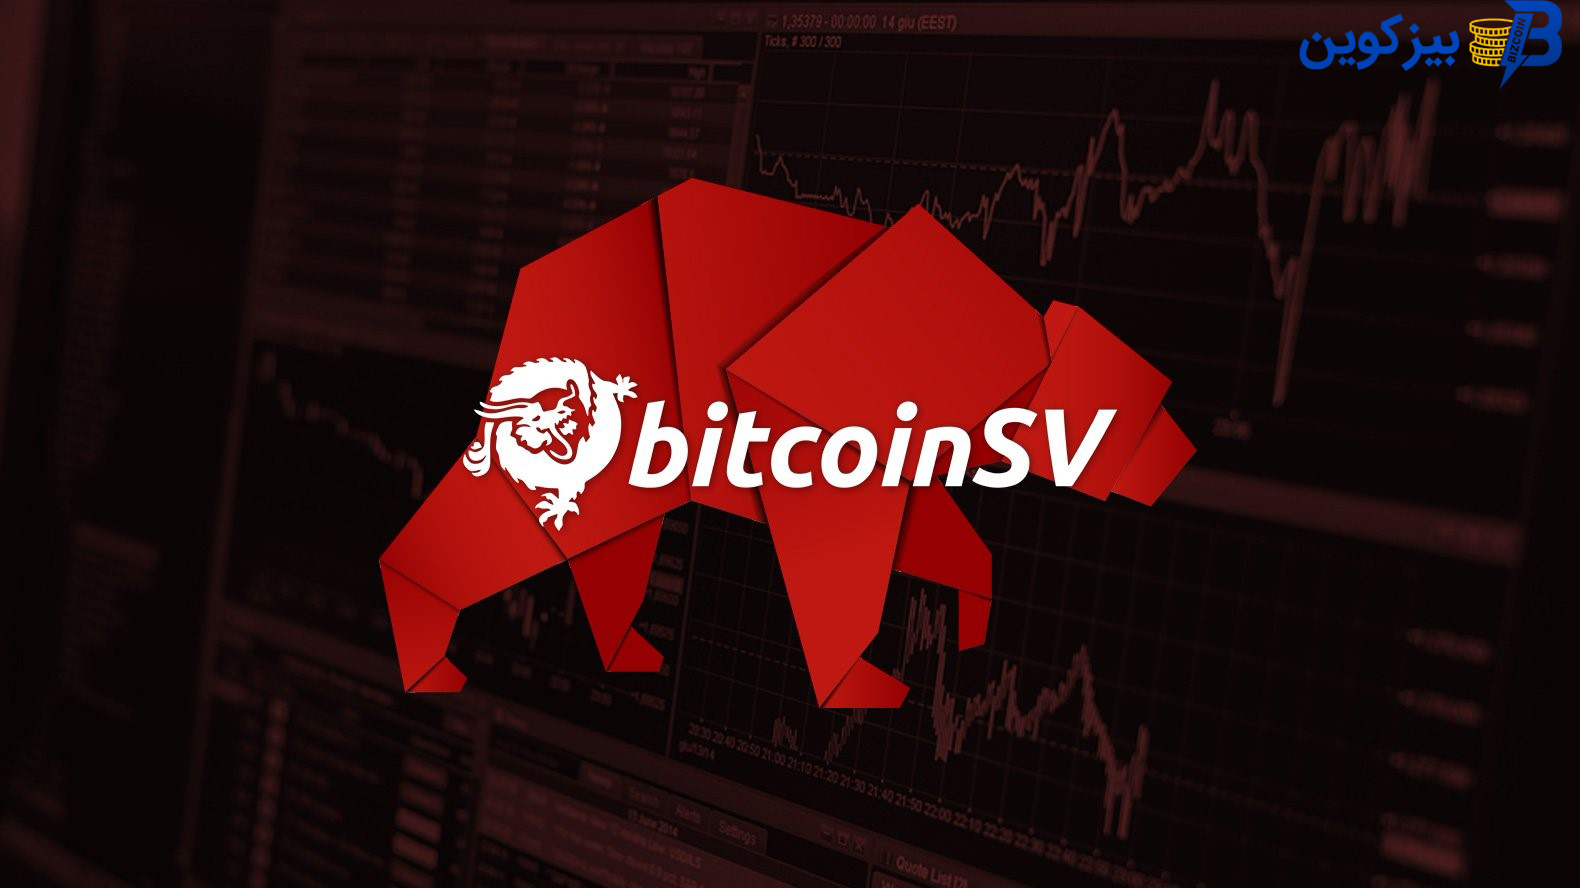 sell bitcoin sv 2 آشنایی با روش فروش بیت کوین اس وی (bitcoin sv)